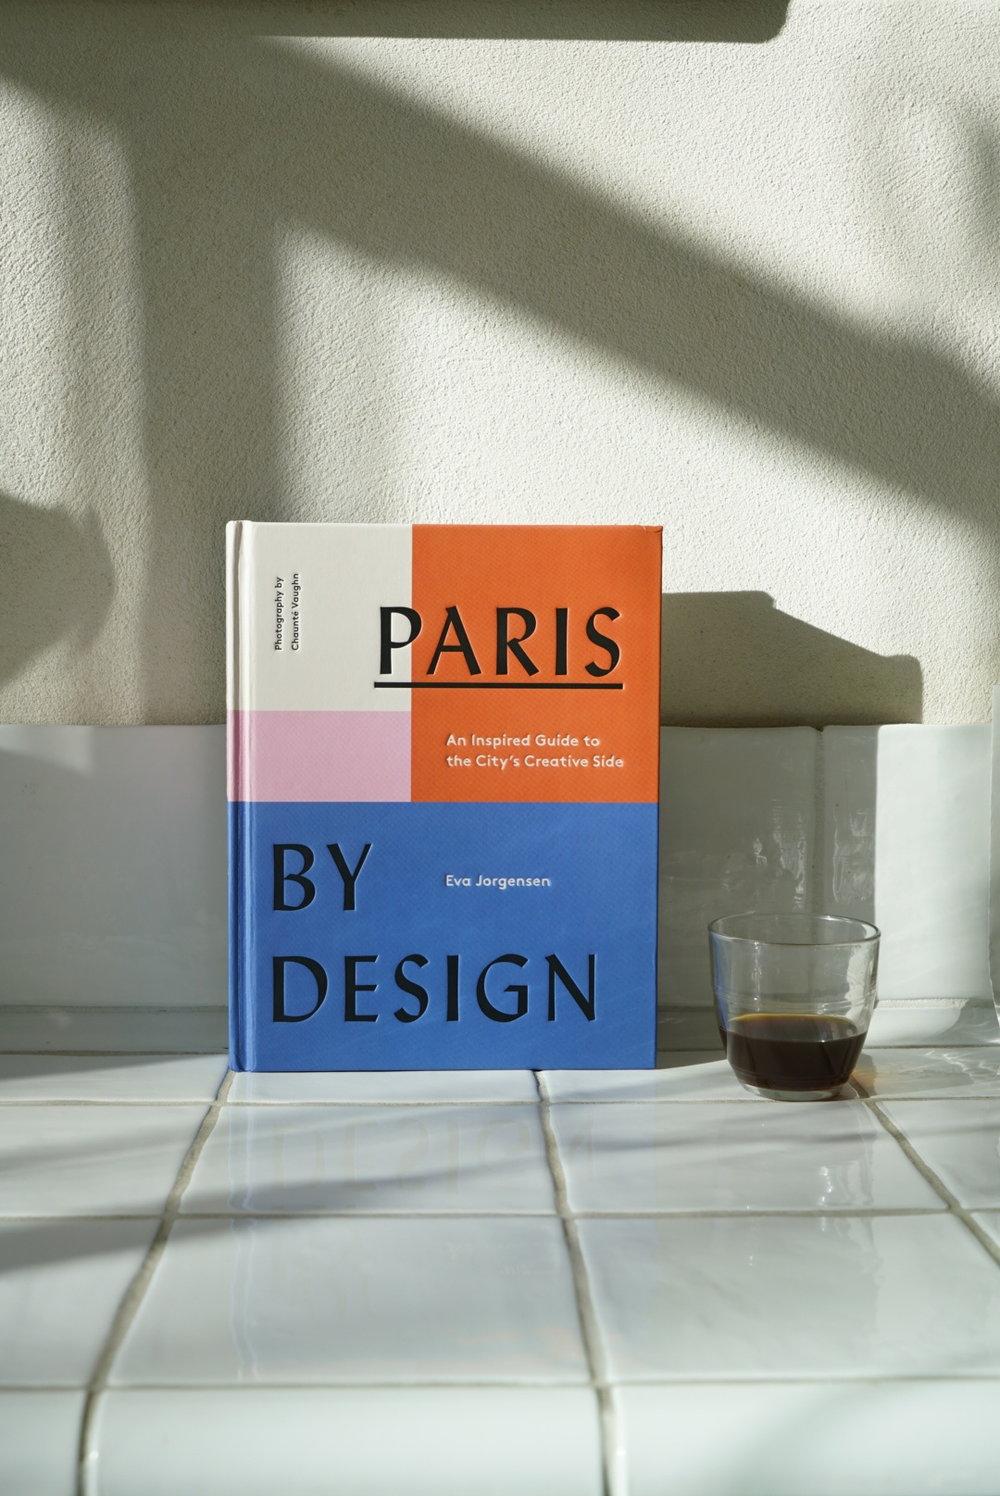 Paris by Design. Image by Chaunte Vaughn